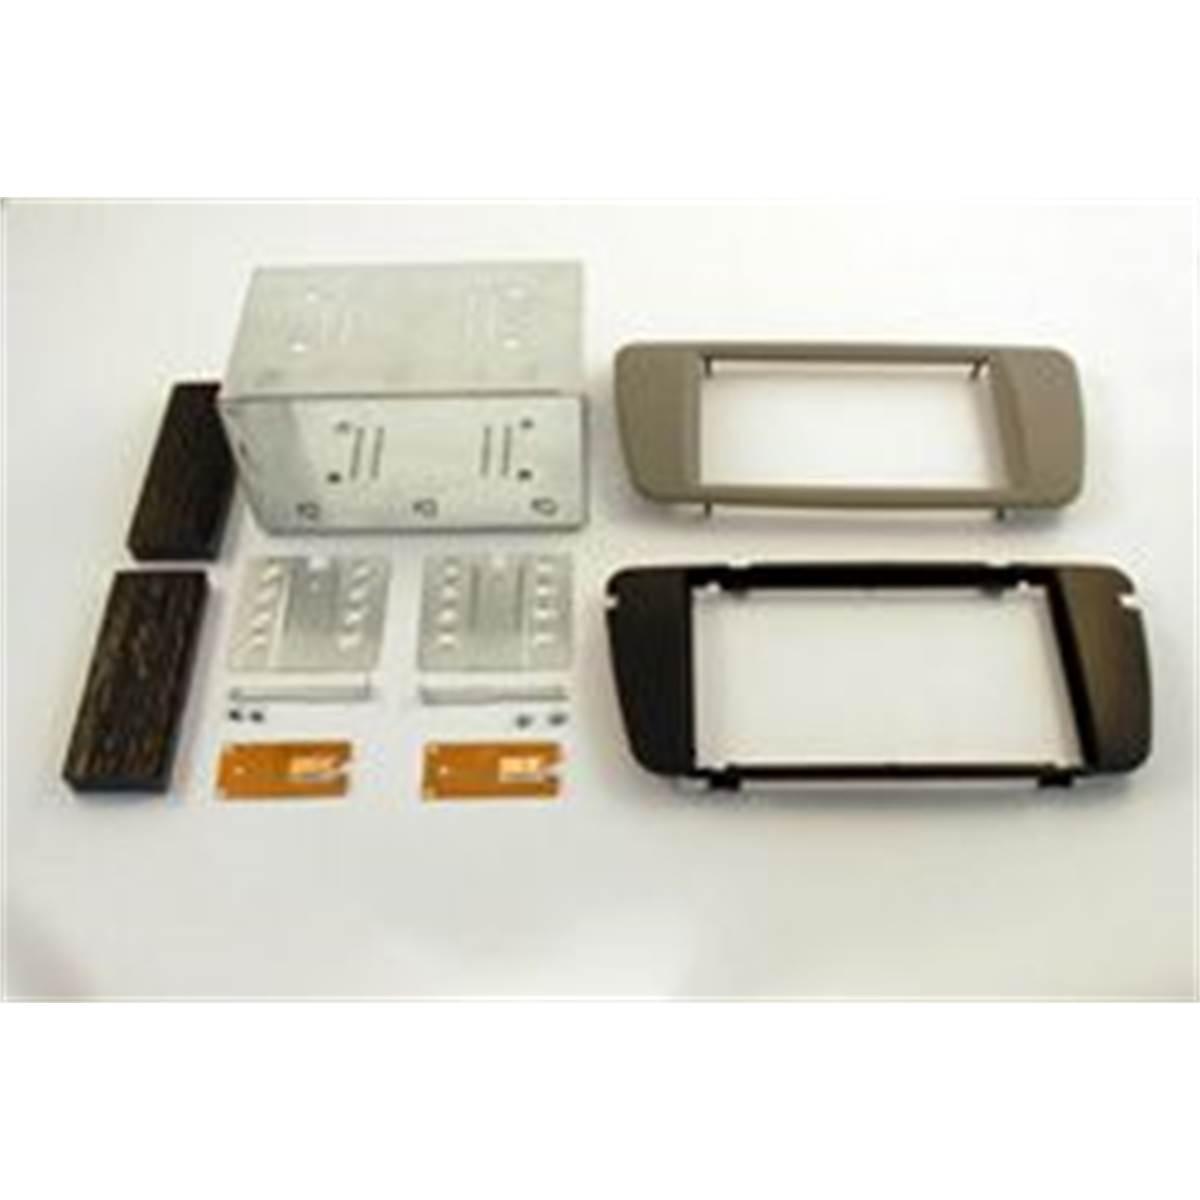 Support Décor double DIN (gris clair) Autoradio spécial SEAT IBIZA 2 08>